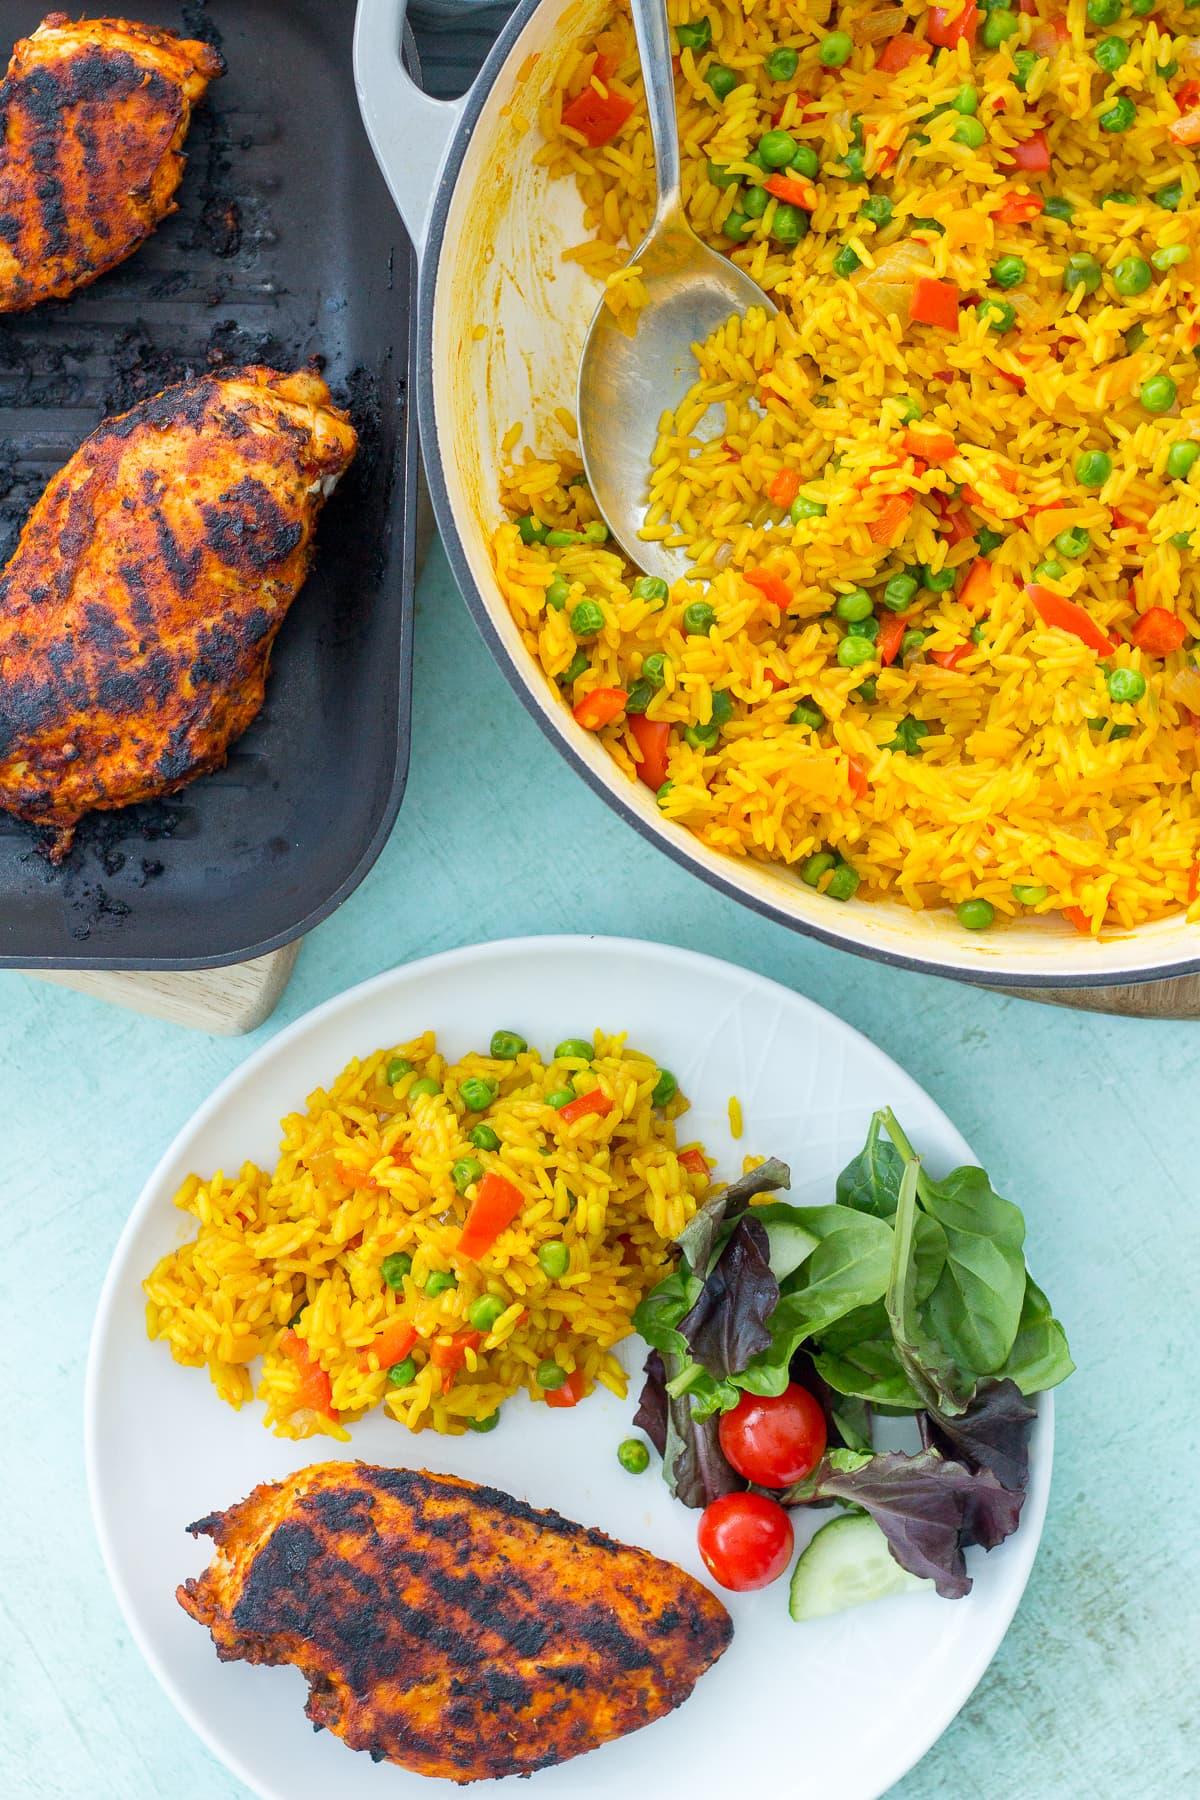 Nandos Peri Peri Chicken Breasts with Homemade Nandos Spicy Rice